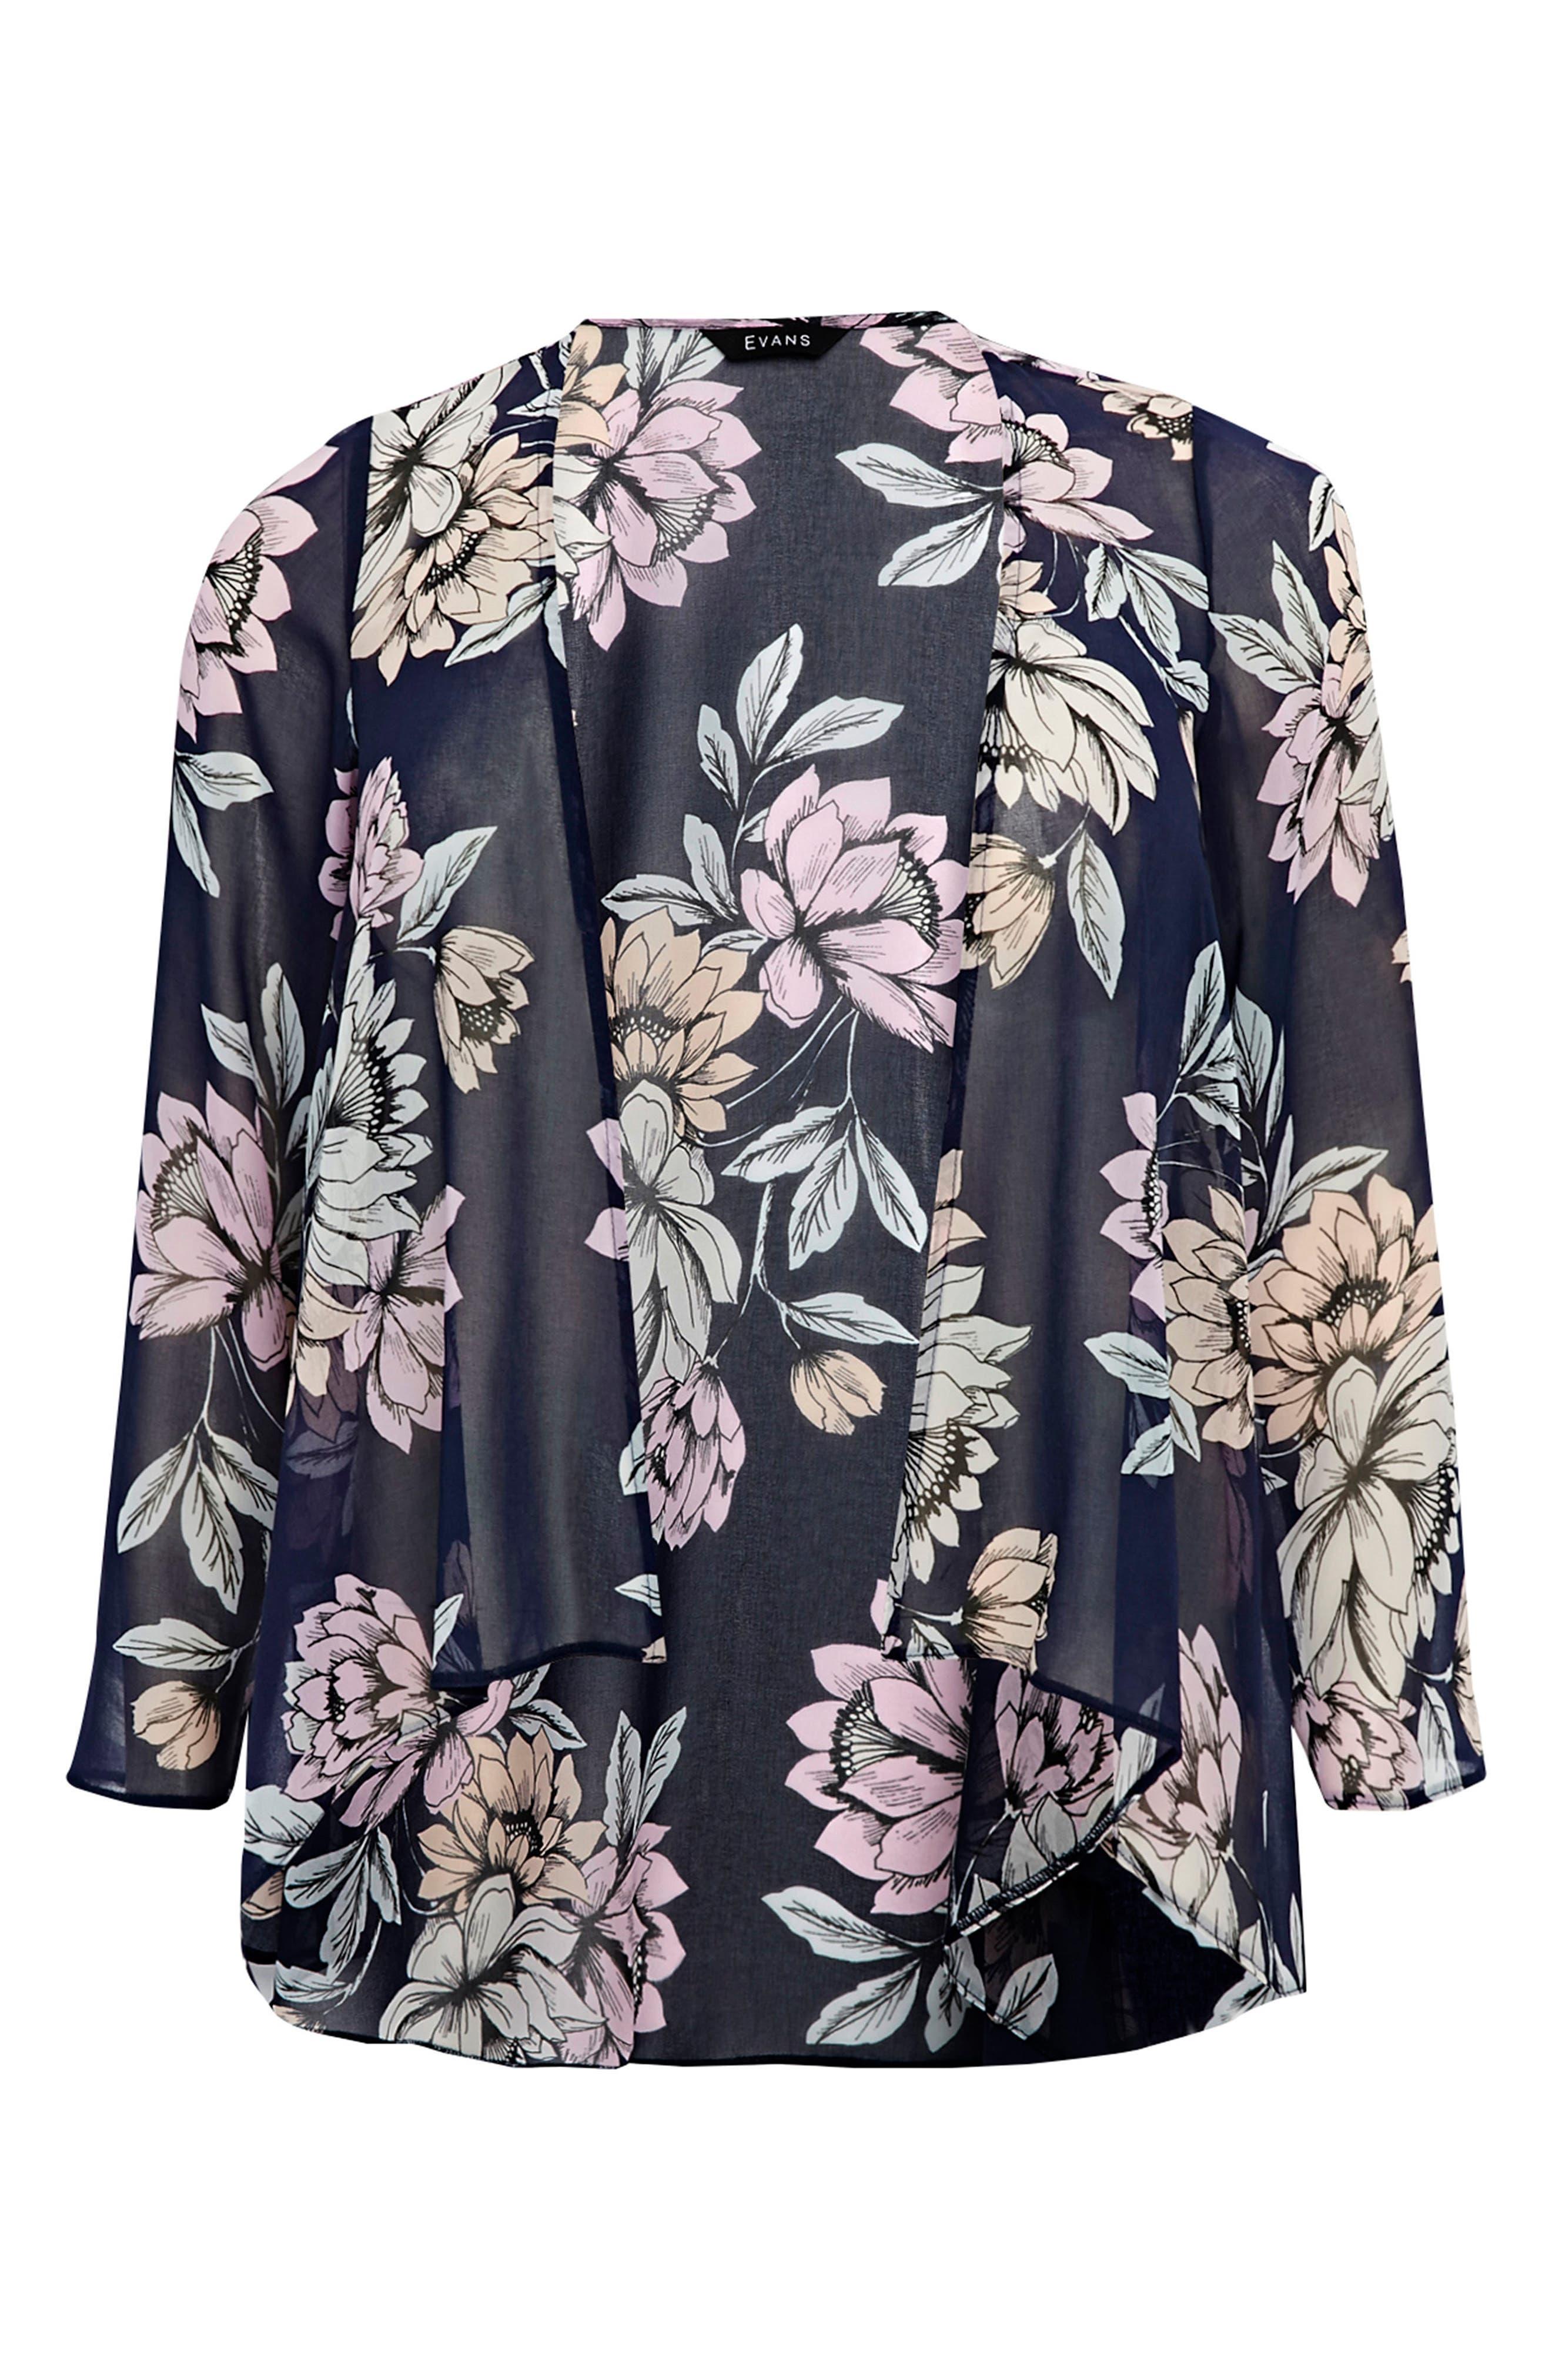 EVANS,                             Floral Kimono Jacket,                             Alternate thumbnail 5, color,                             435